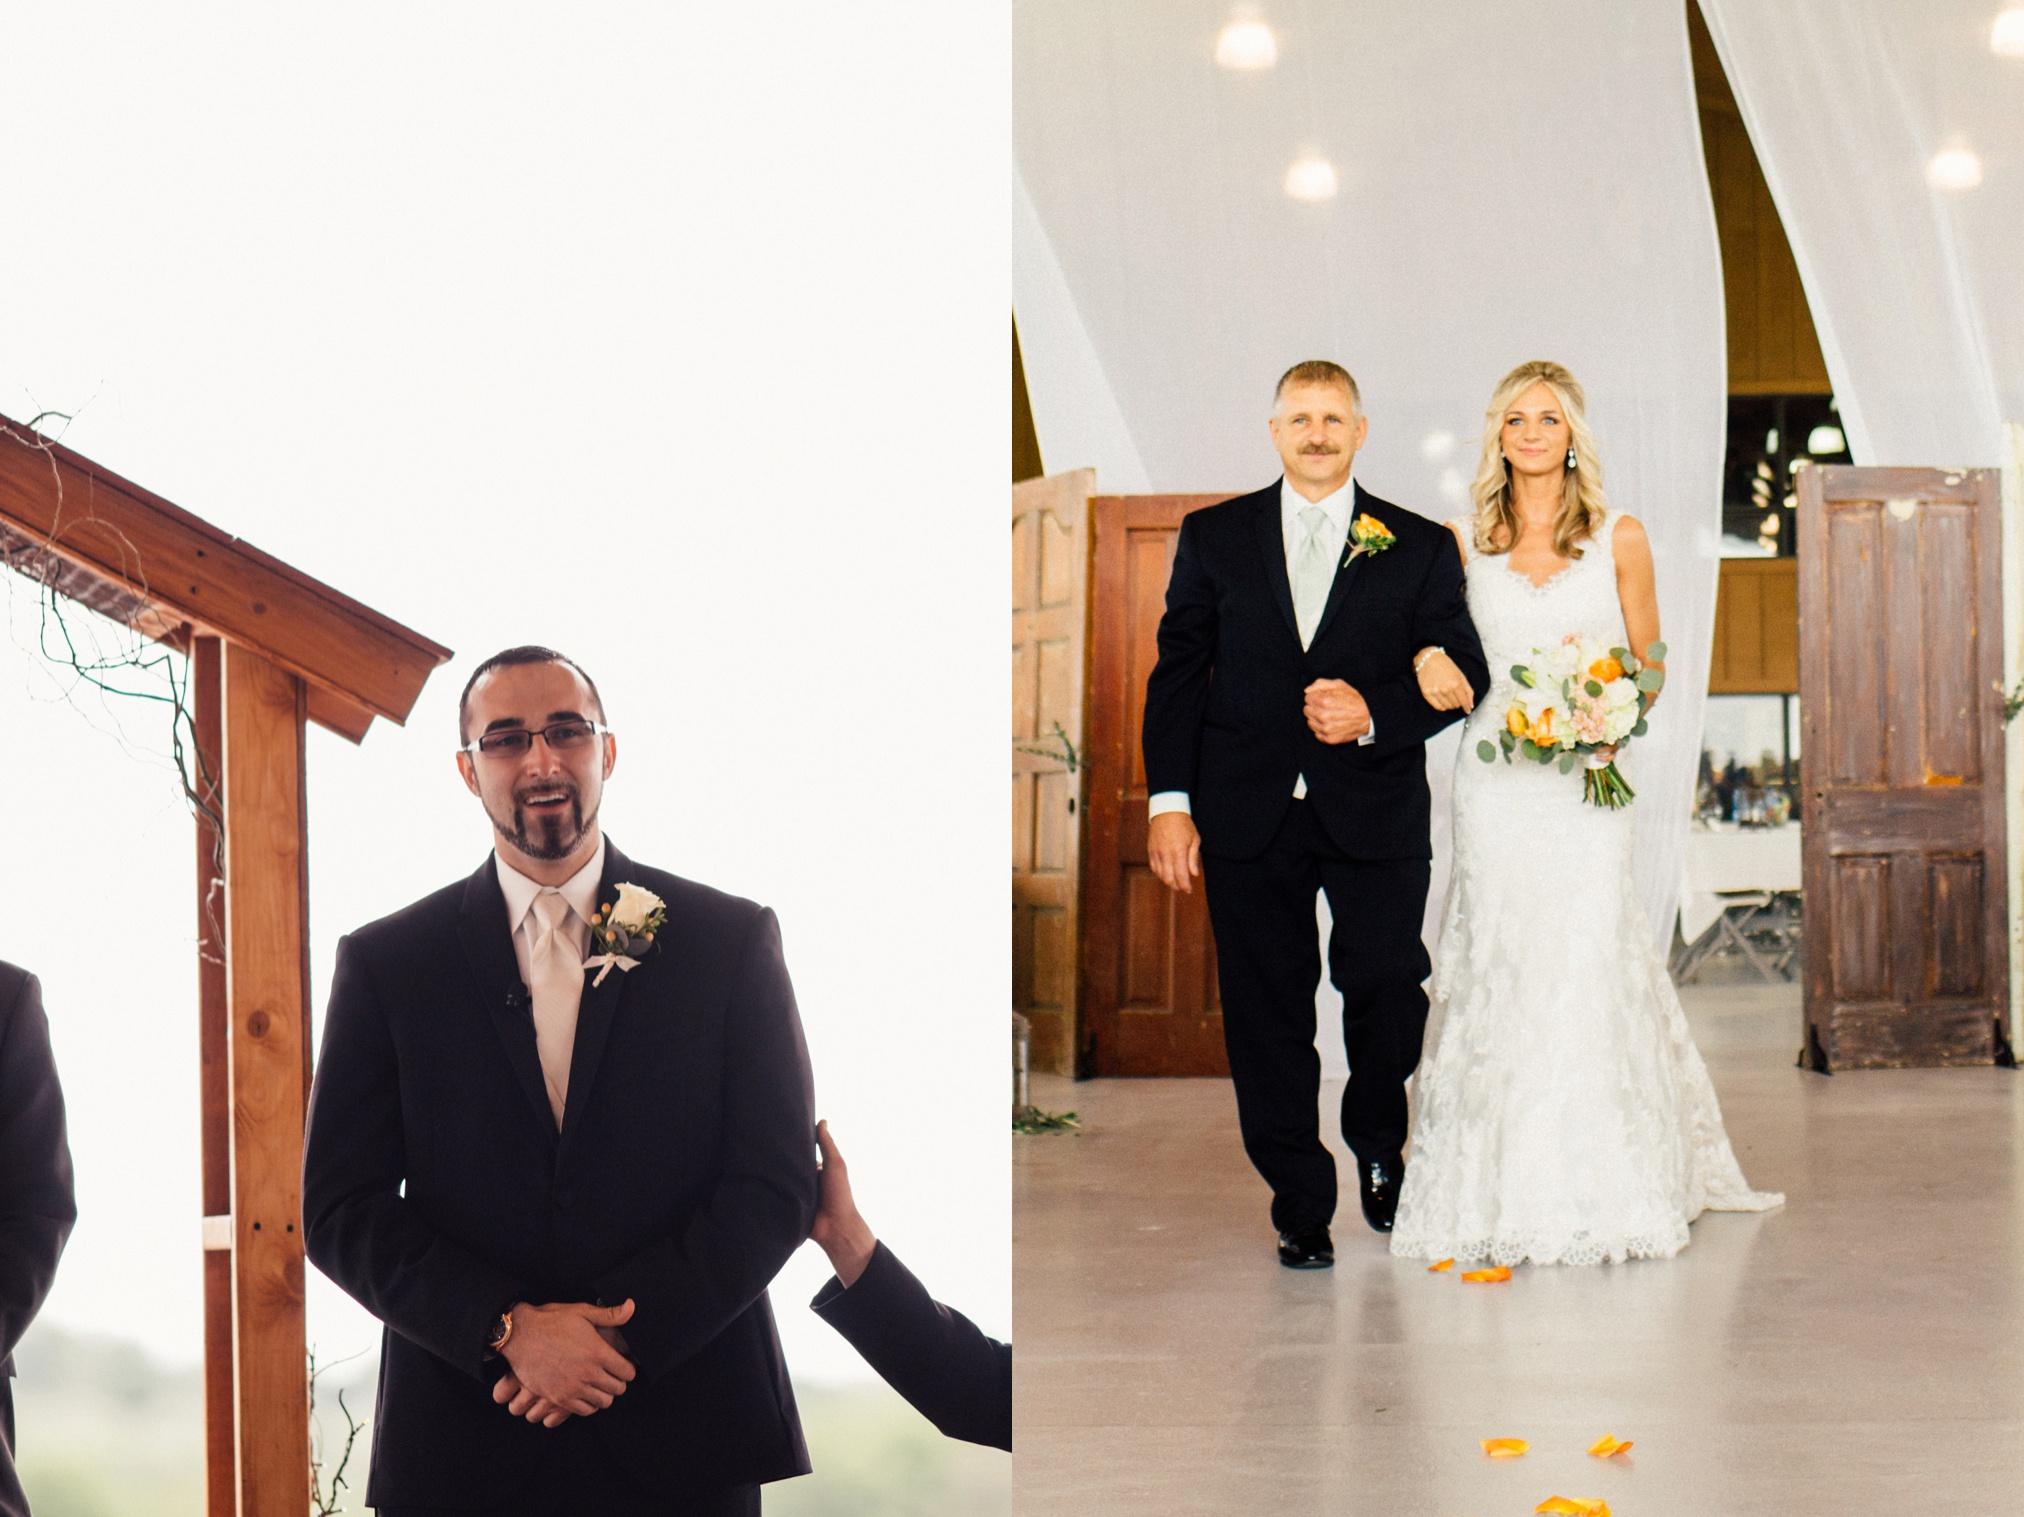 schmid_wedding-381.jpg